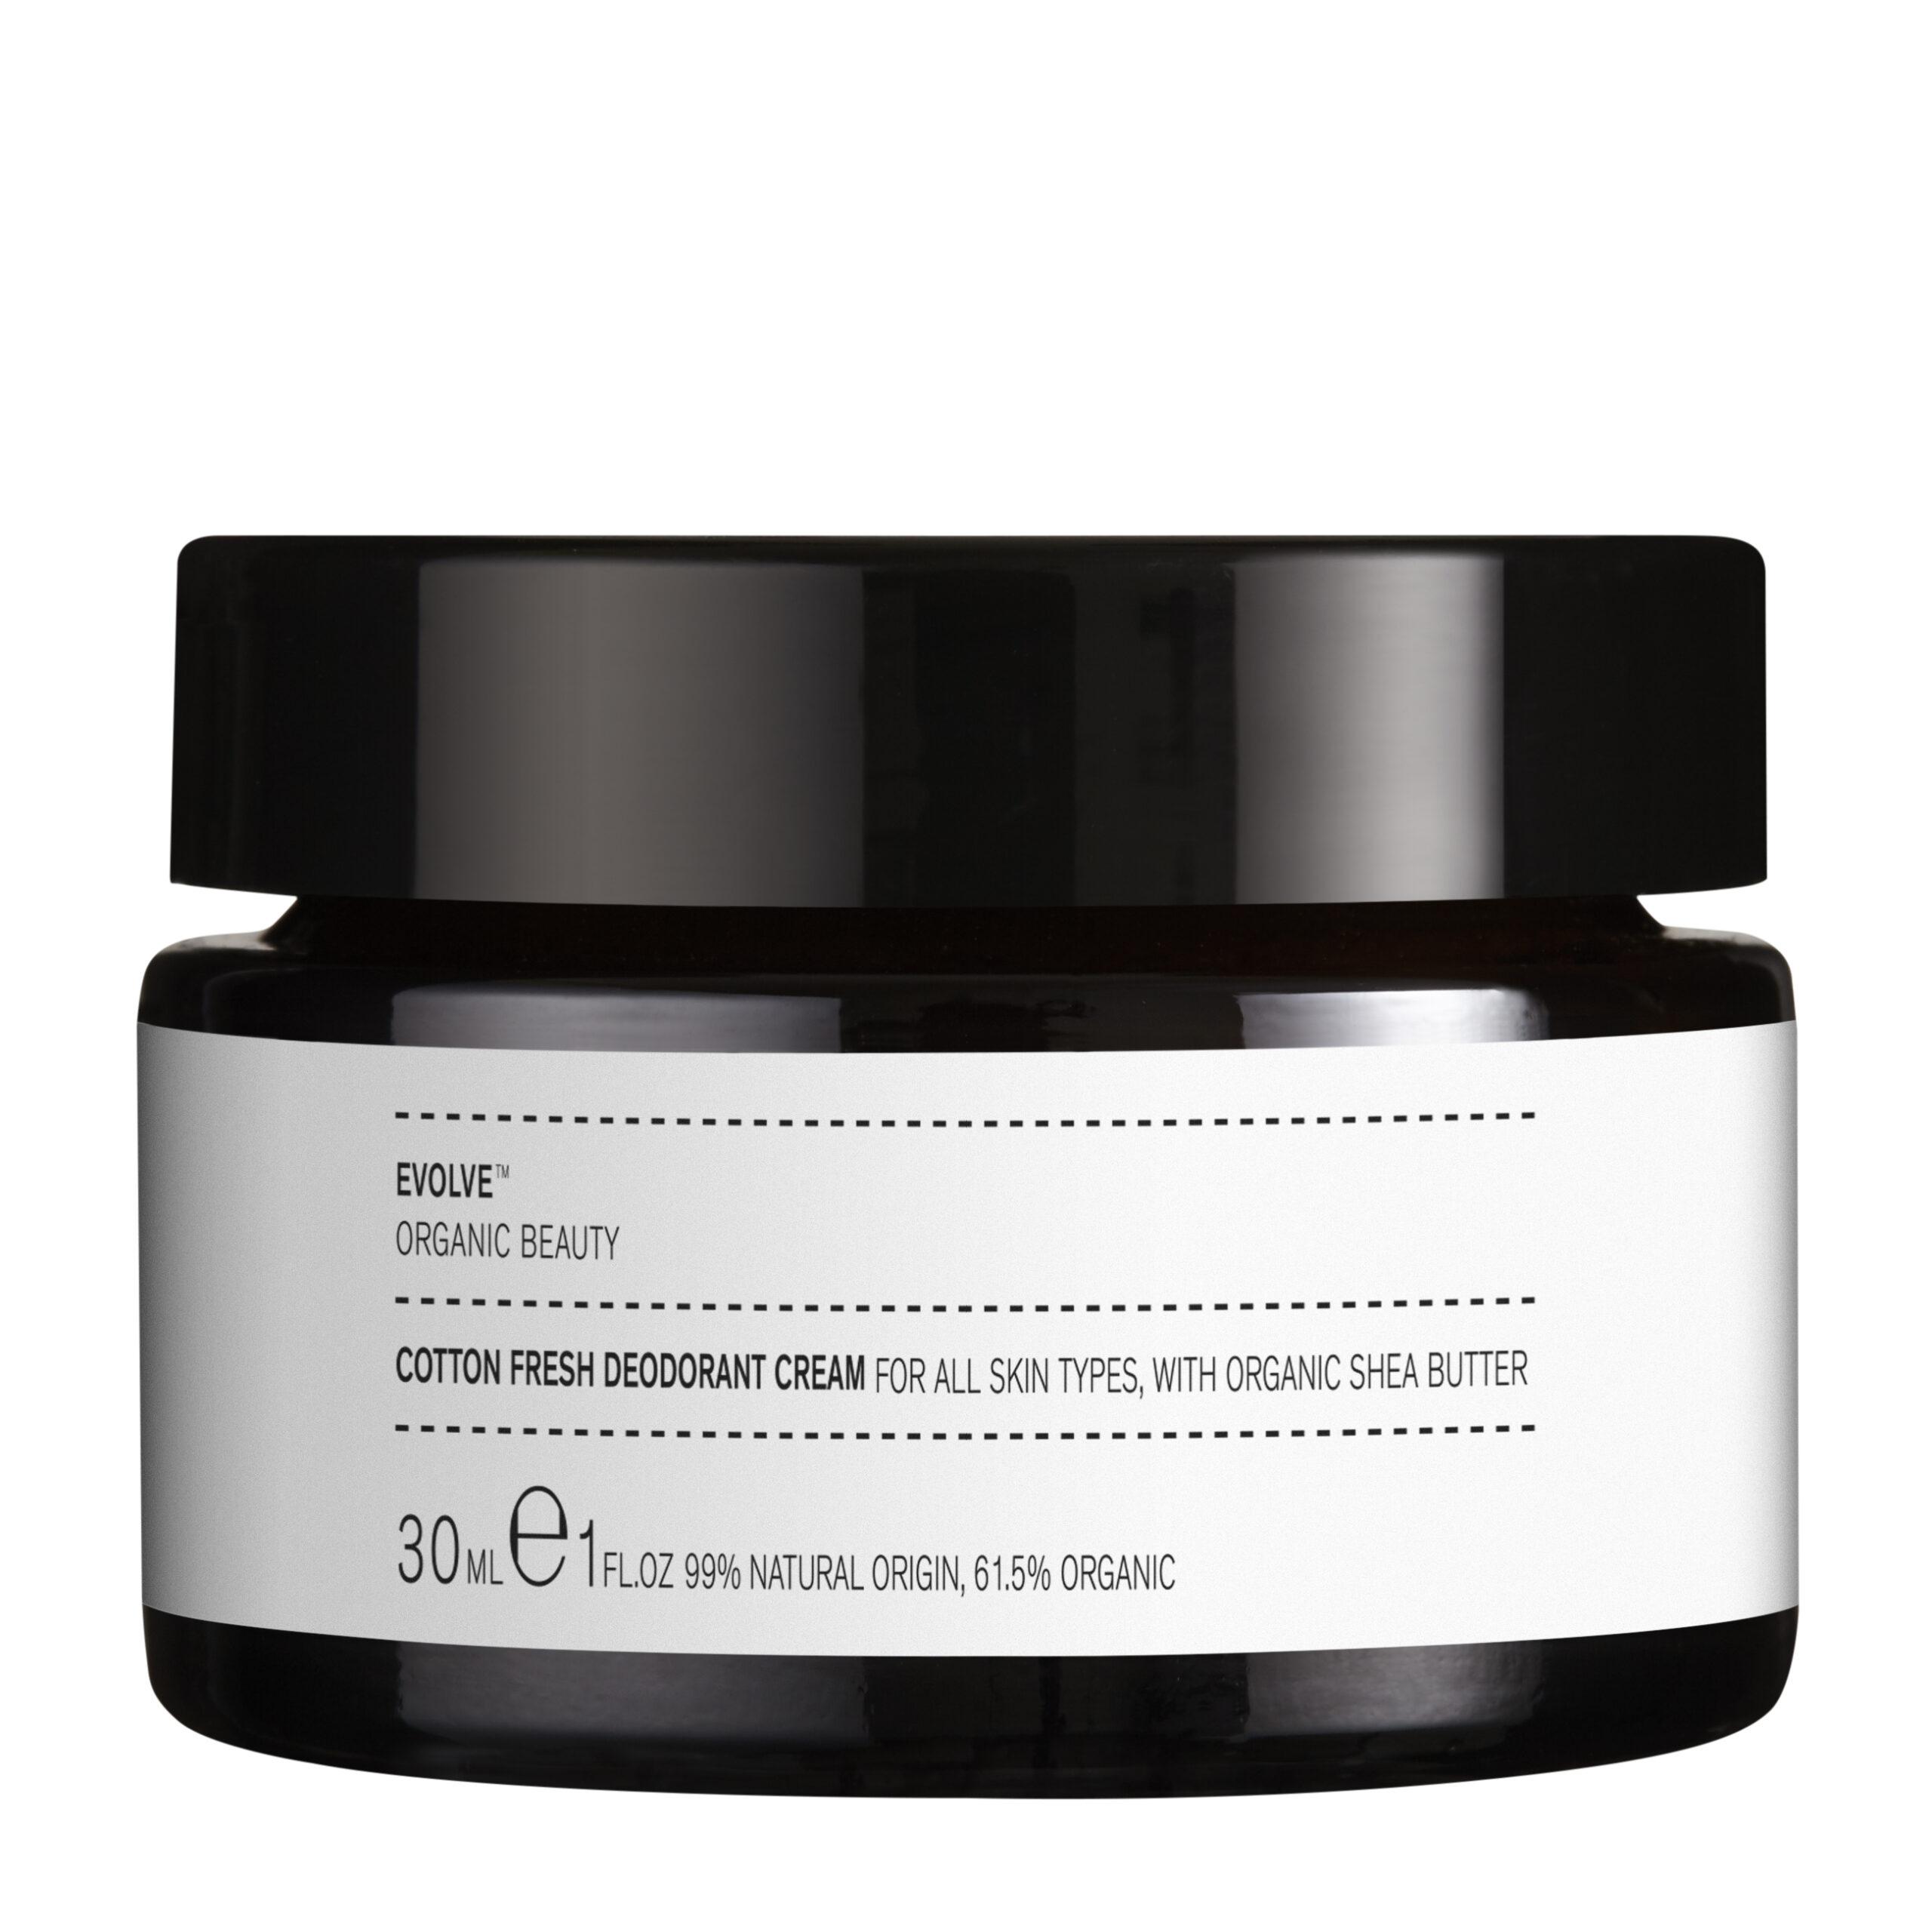 Cotton Fresh Deodorant Cream 30ML – Evolve Beauty